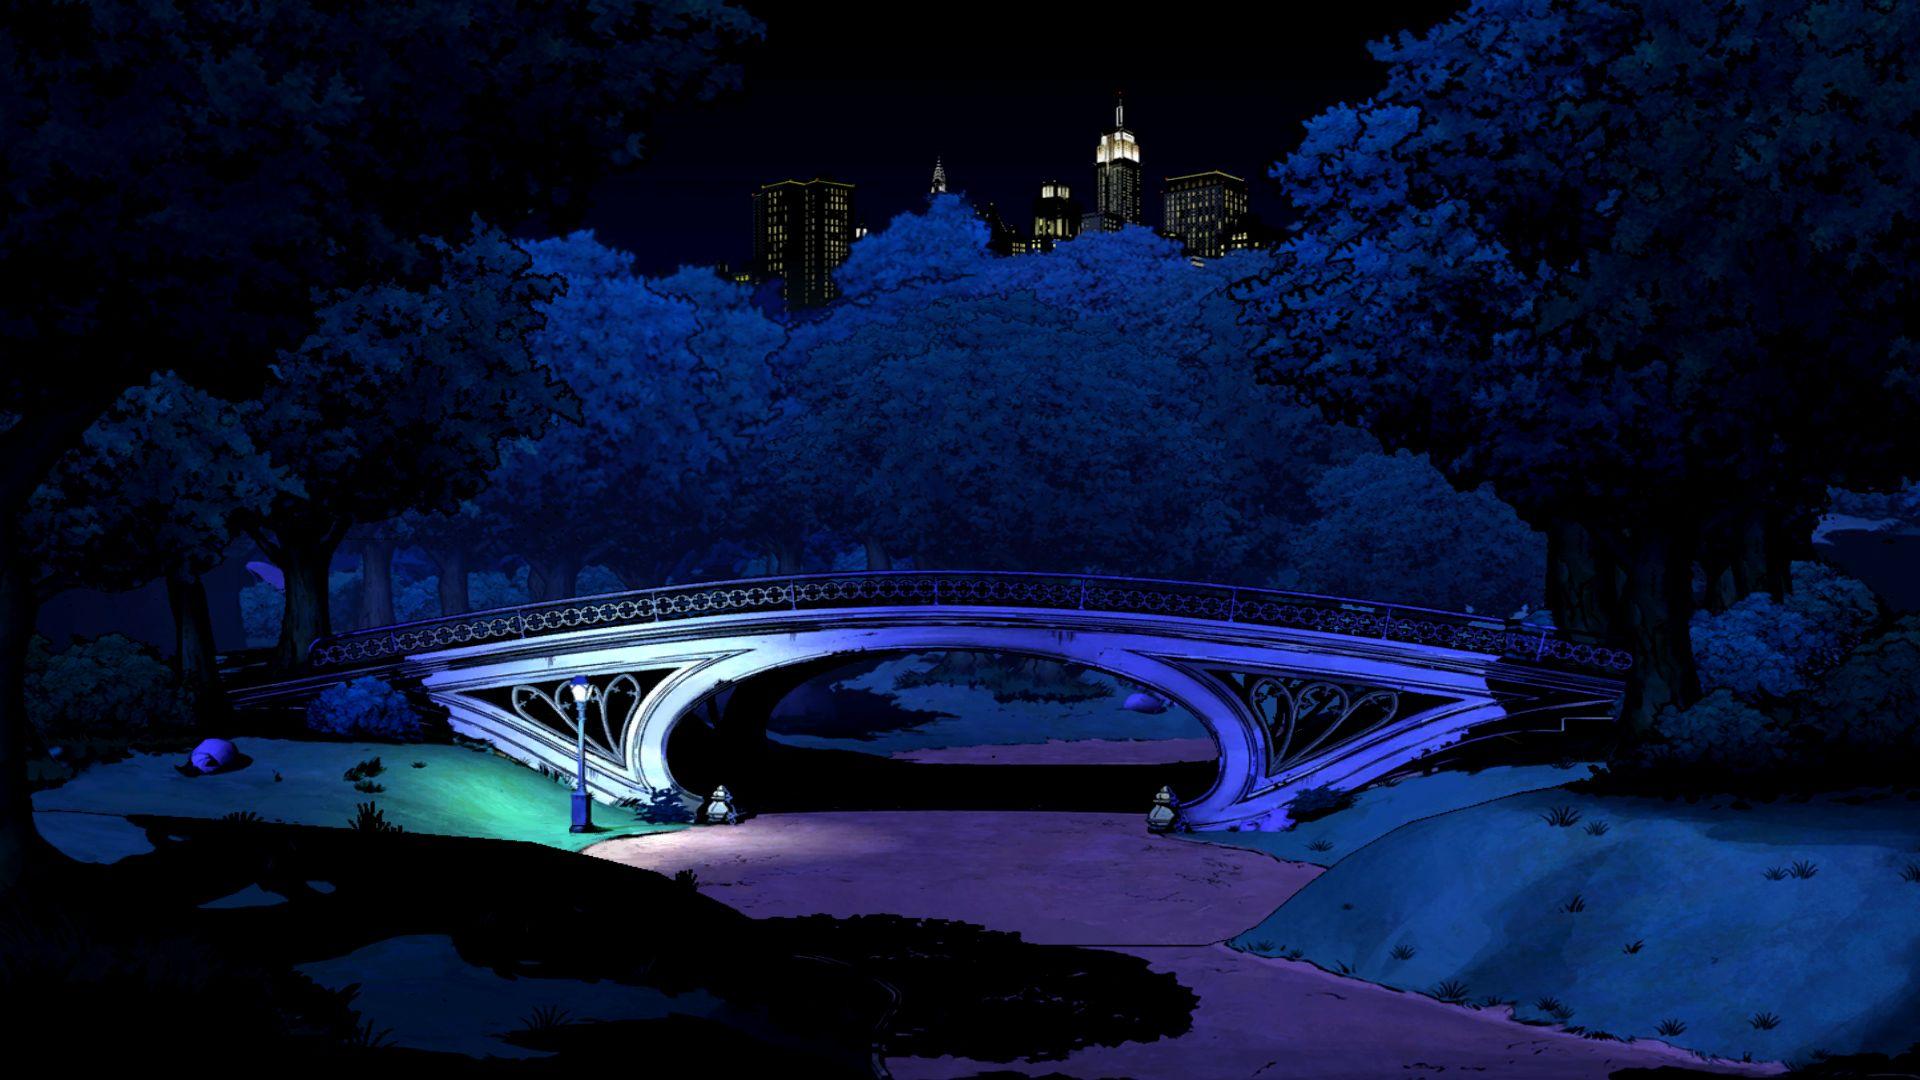 THE WOLF AMONG US game bridge night city f wallpaper background 1920x1080